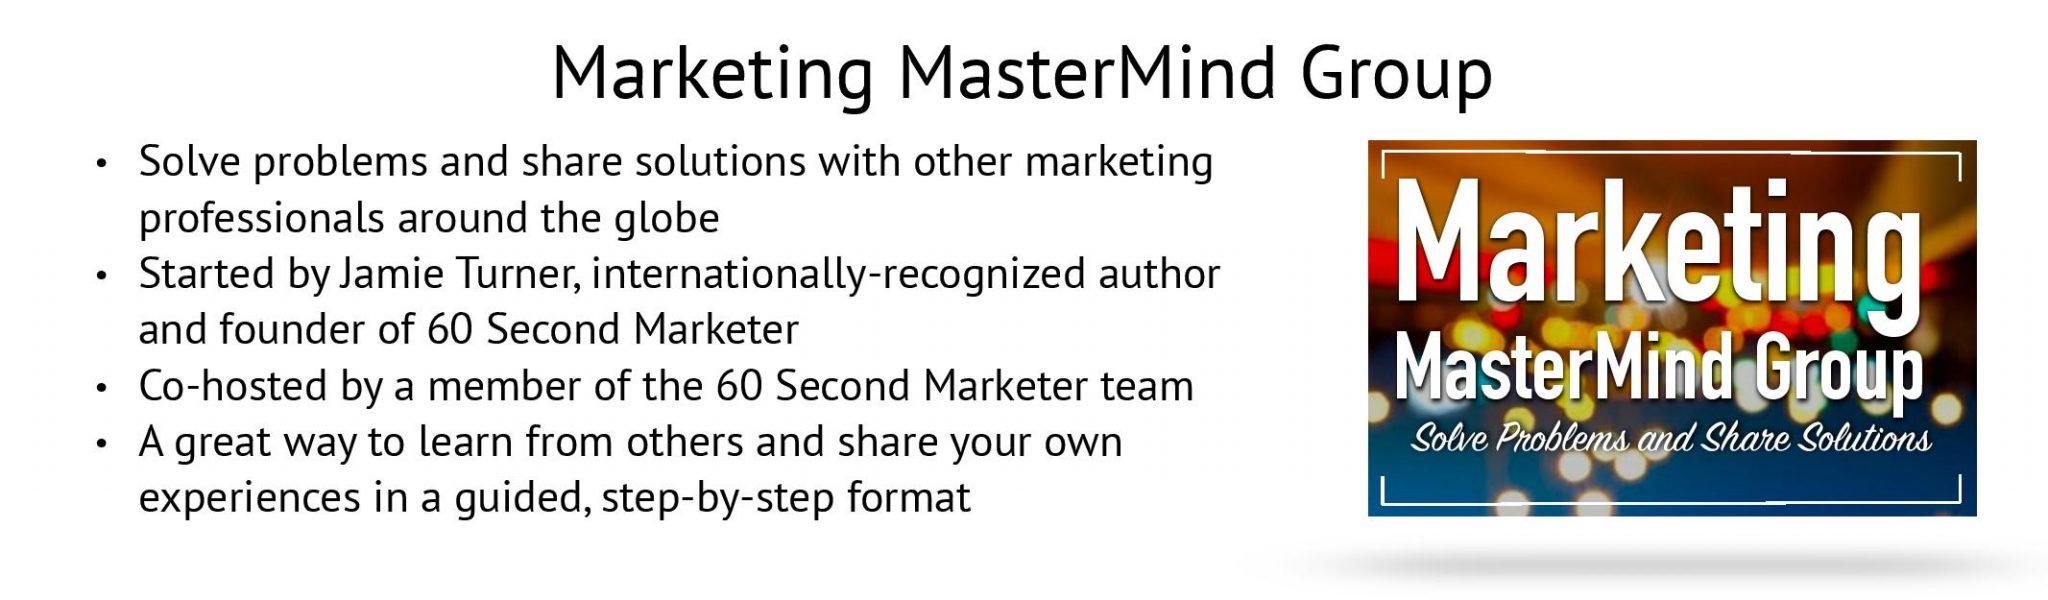 Marketing MasterMind